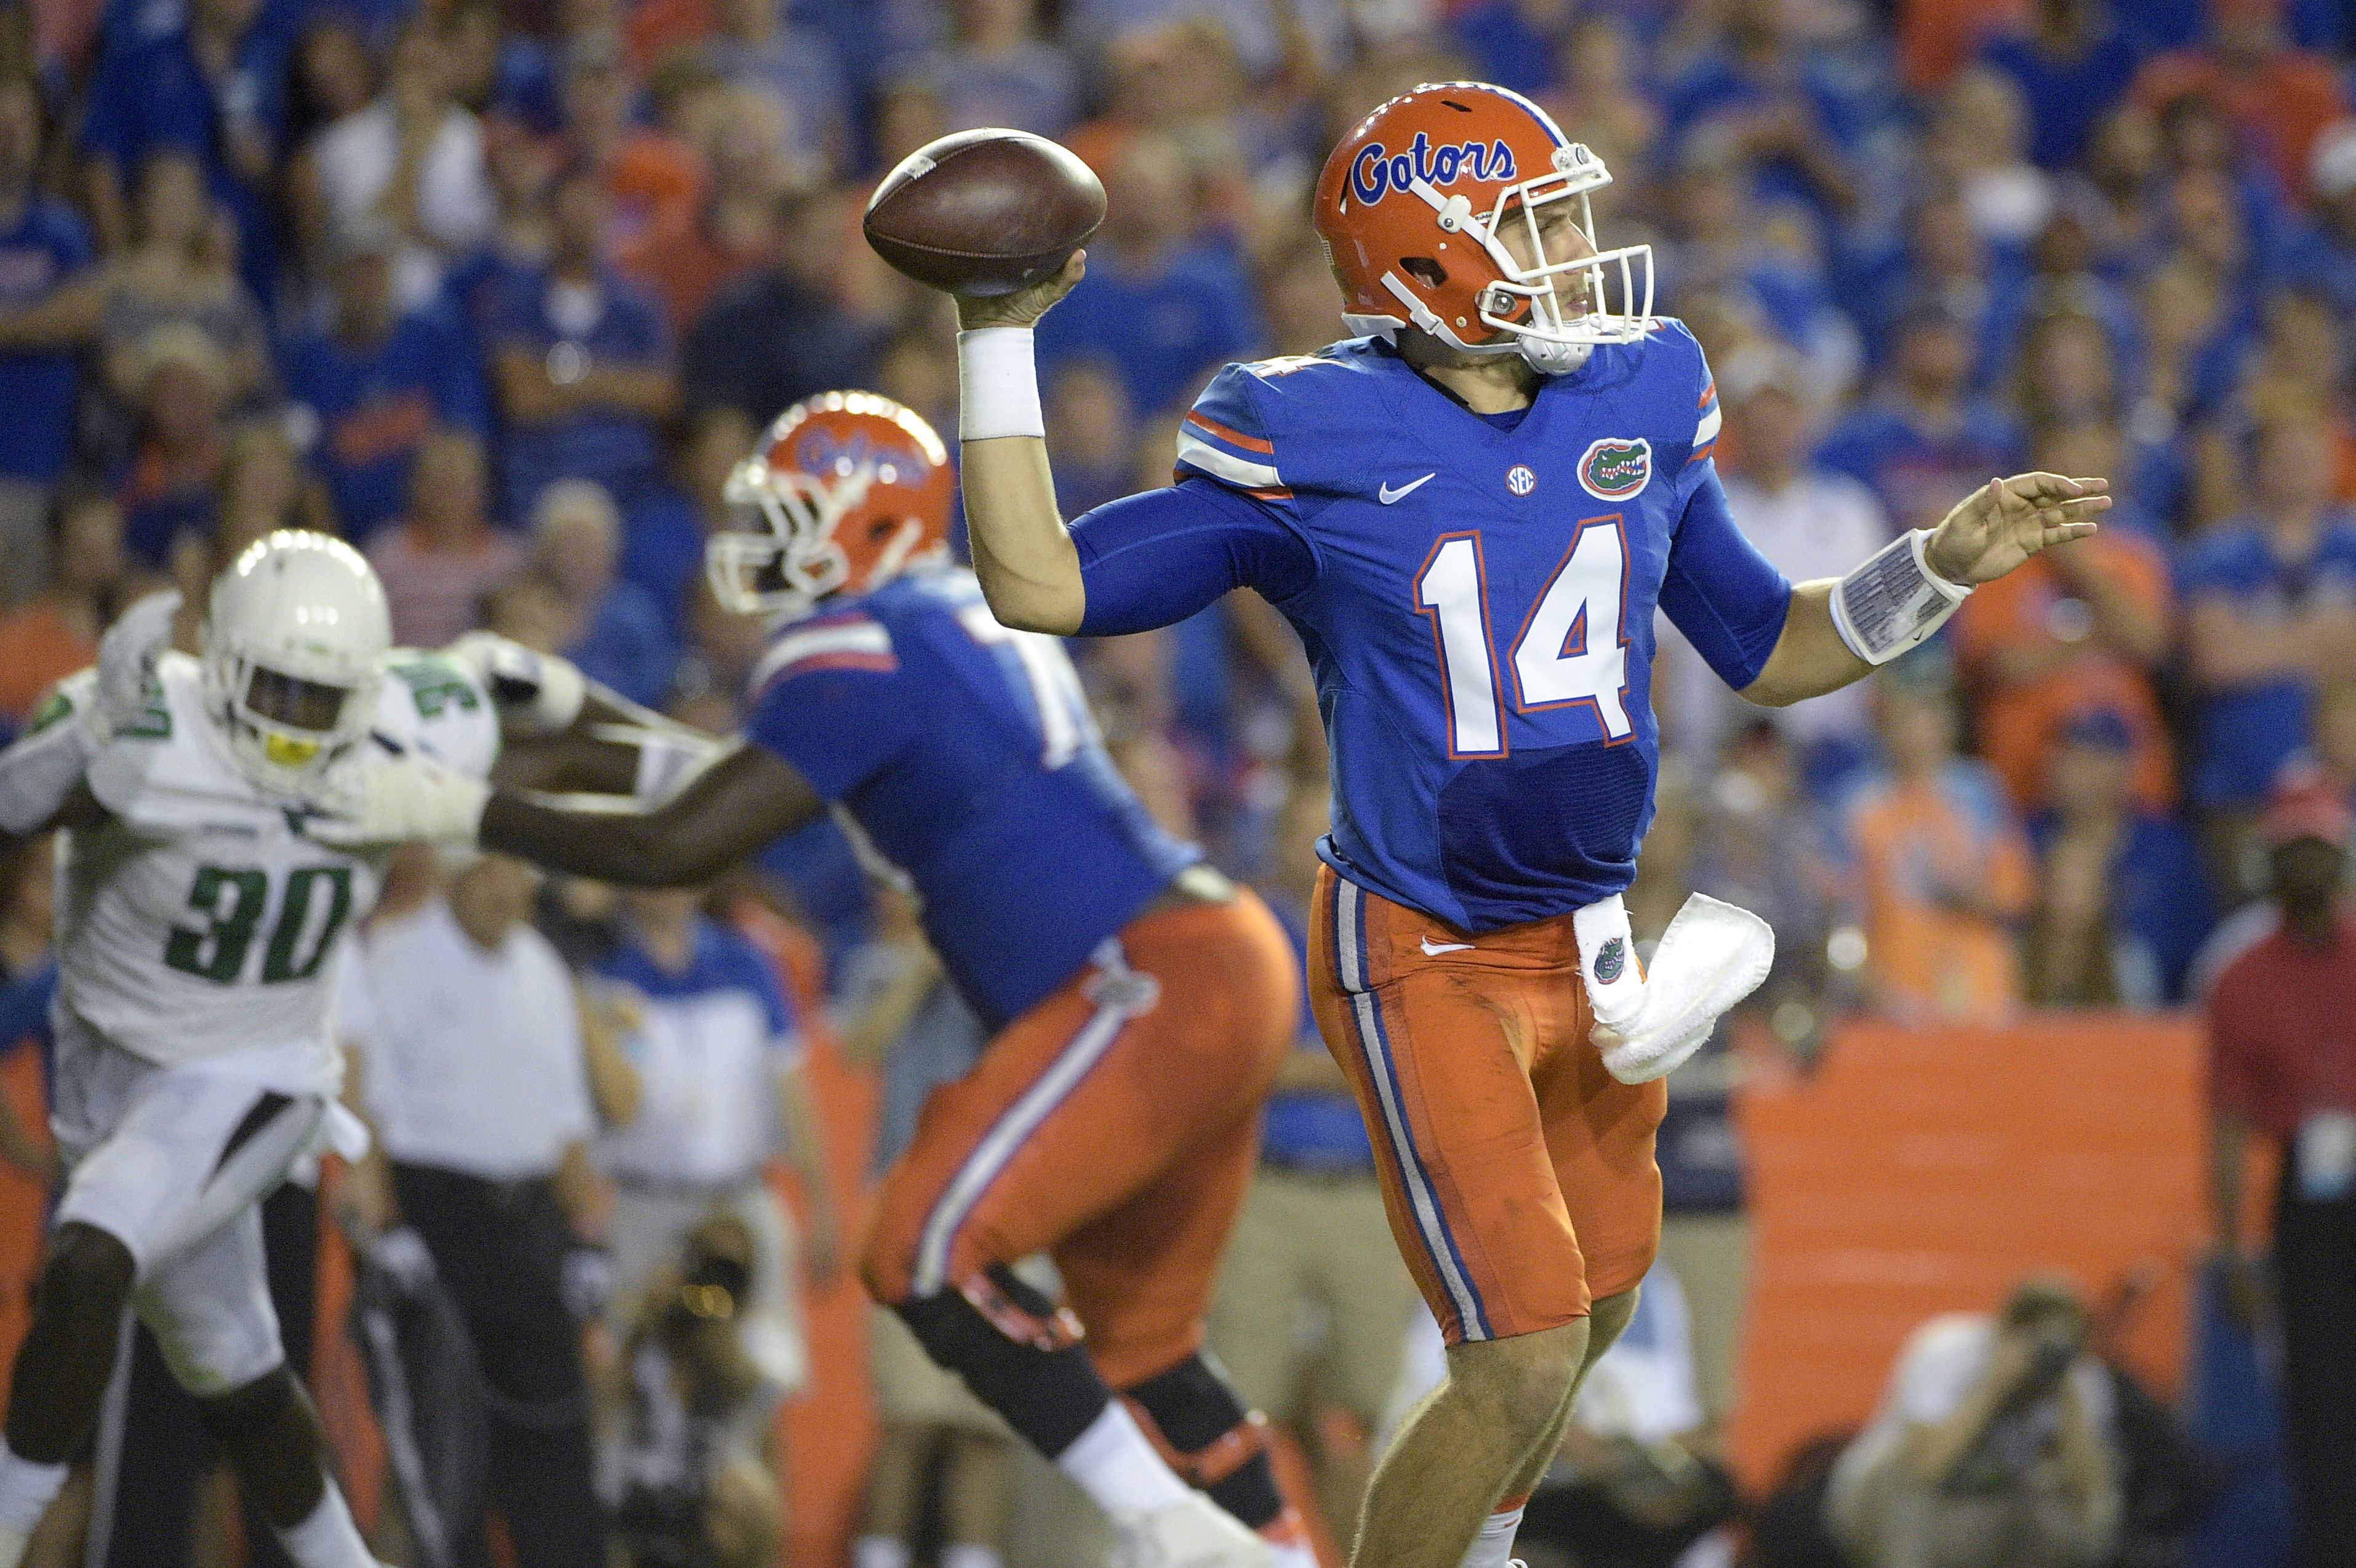 Florida quarterback Luke Del Rio (14) throws a pass against North Texas during the first half of an NCAA college football game in Gainesville, Fla., Saturday, Sept. 17, 2016. Florida won 32-0. (AP Photo/Phelan M. Ebenhack)